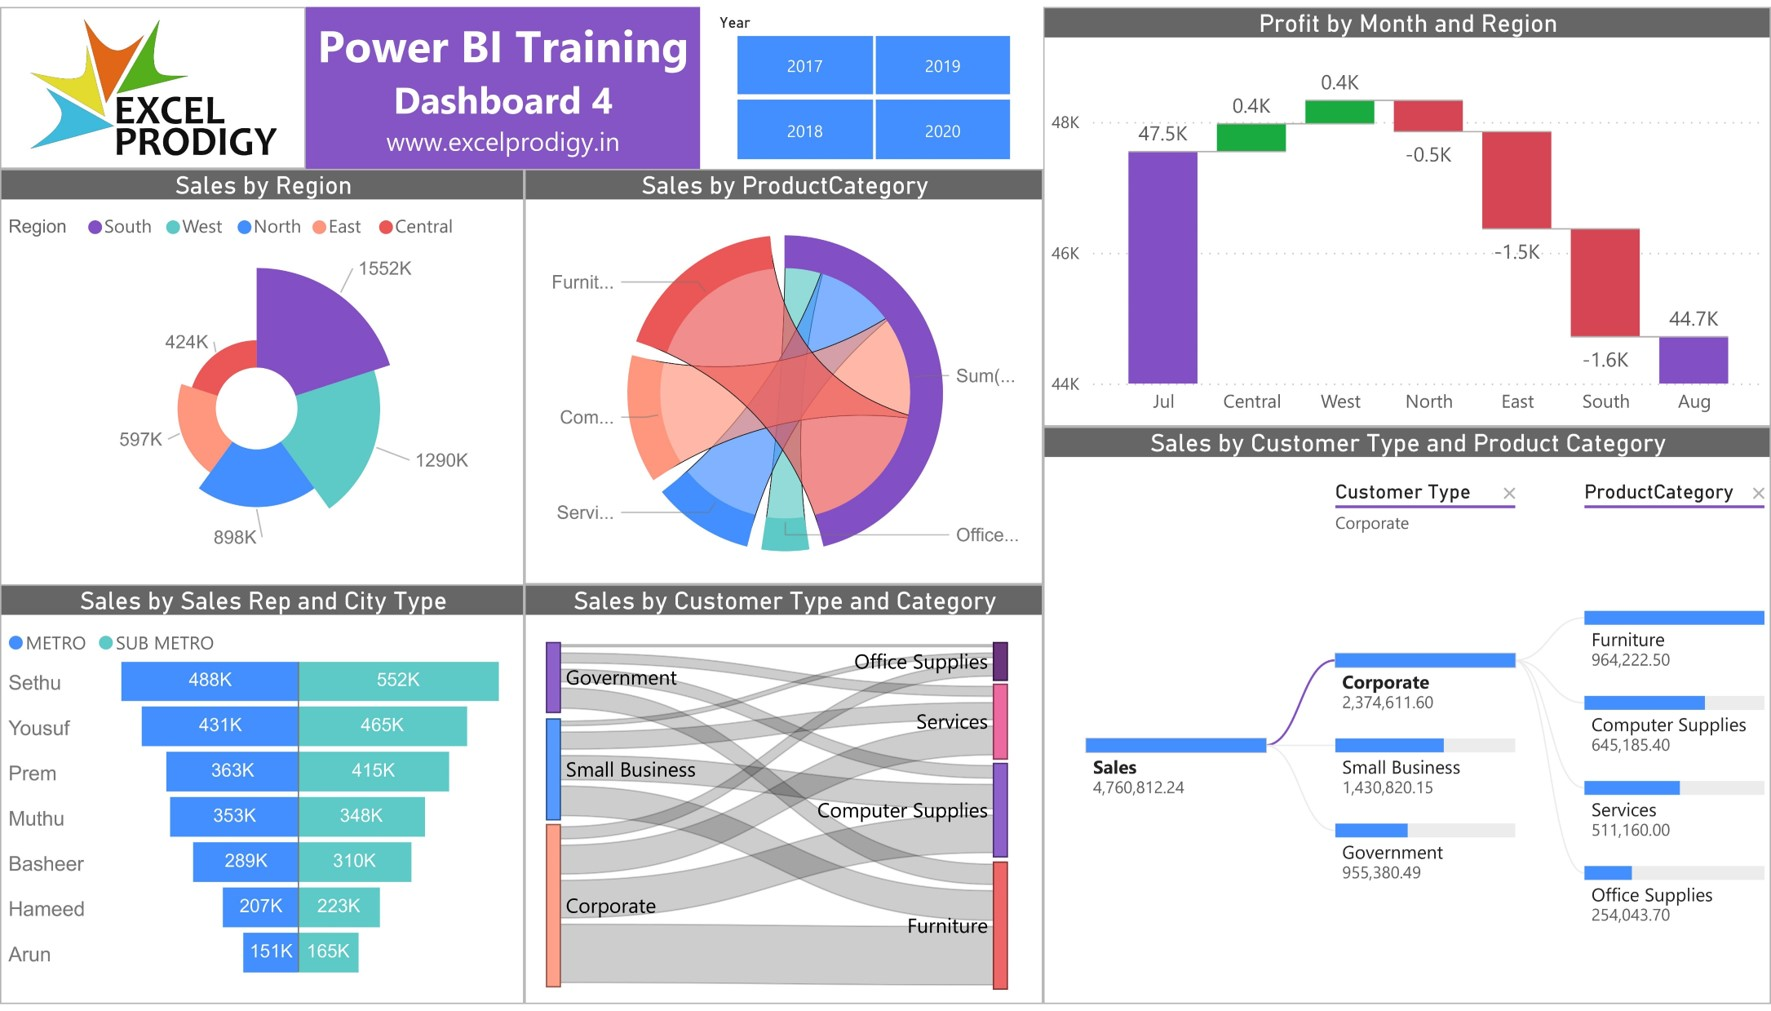 Power Bi Training - Dashboard 4